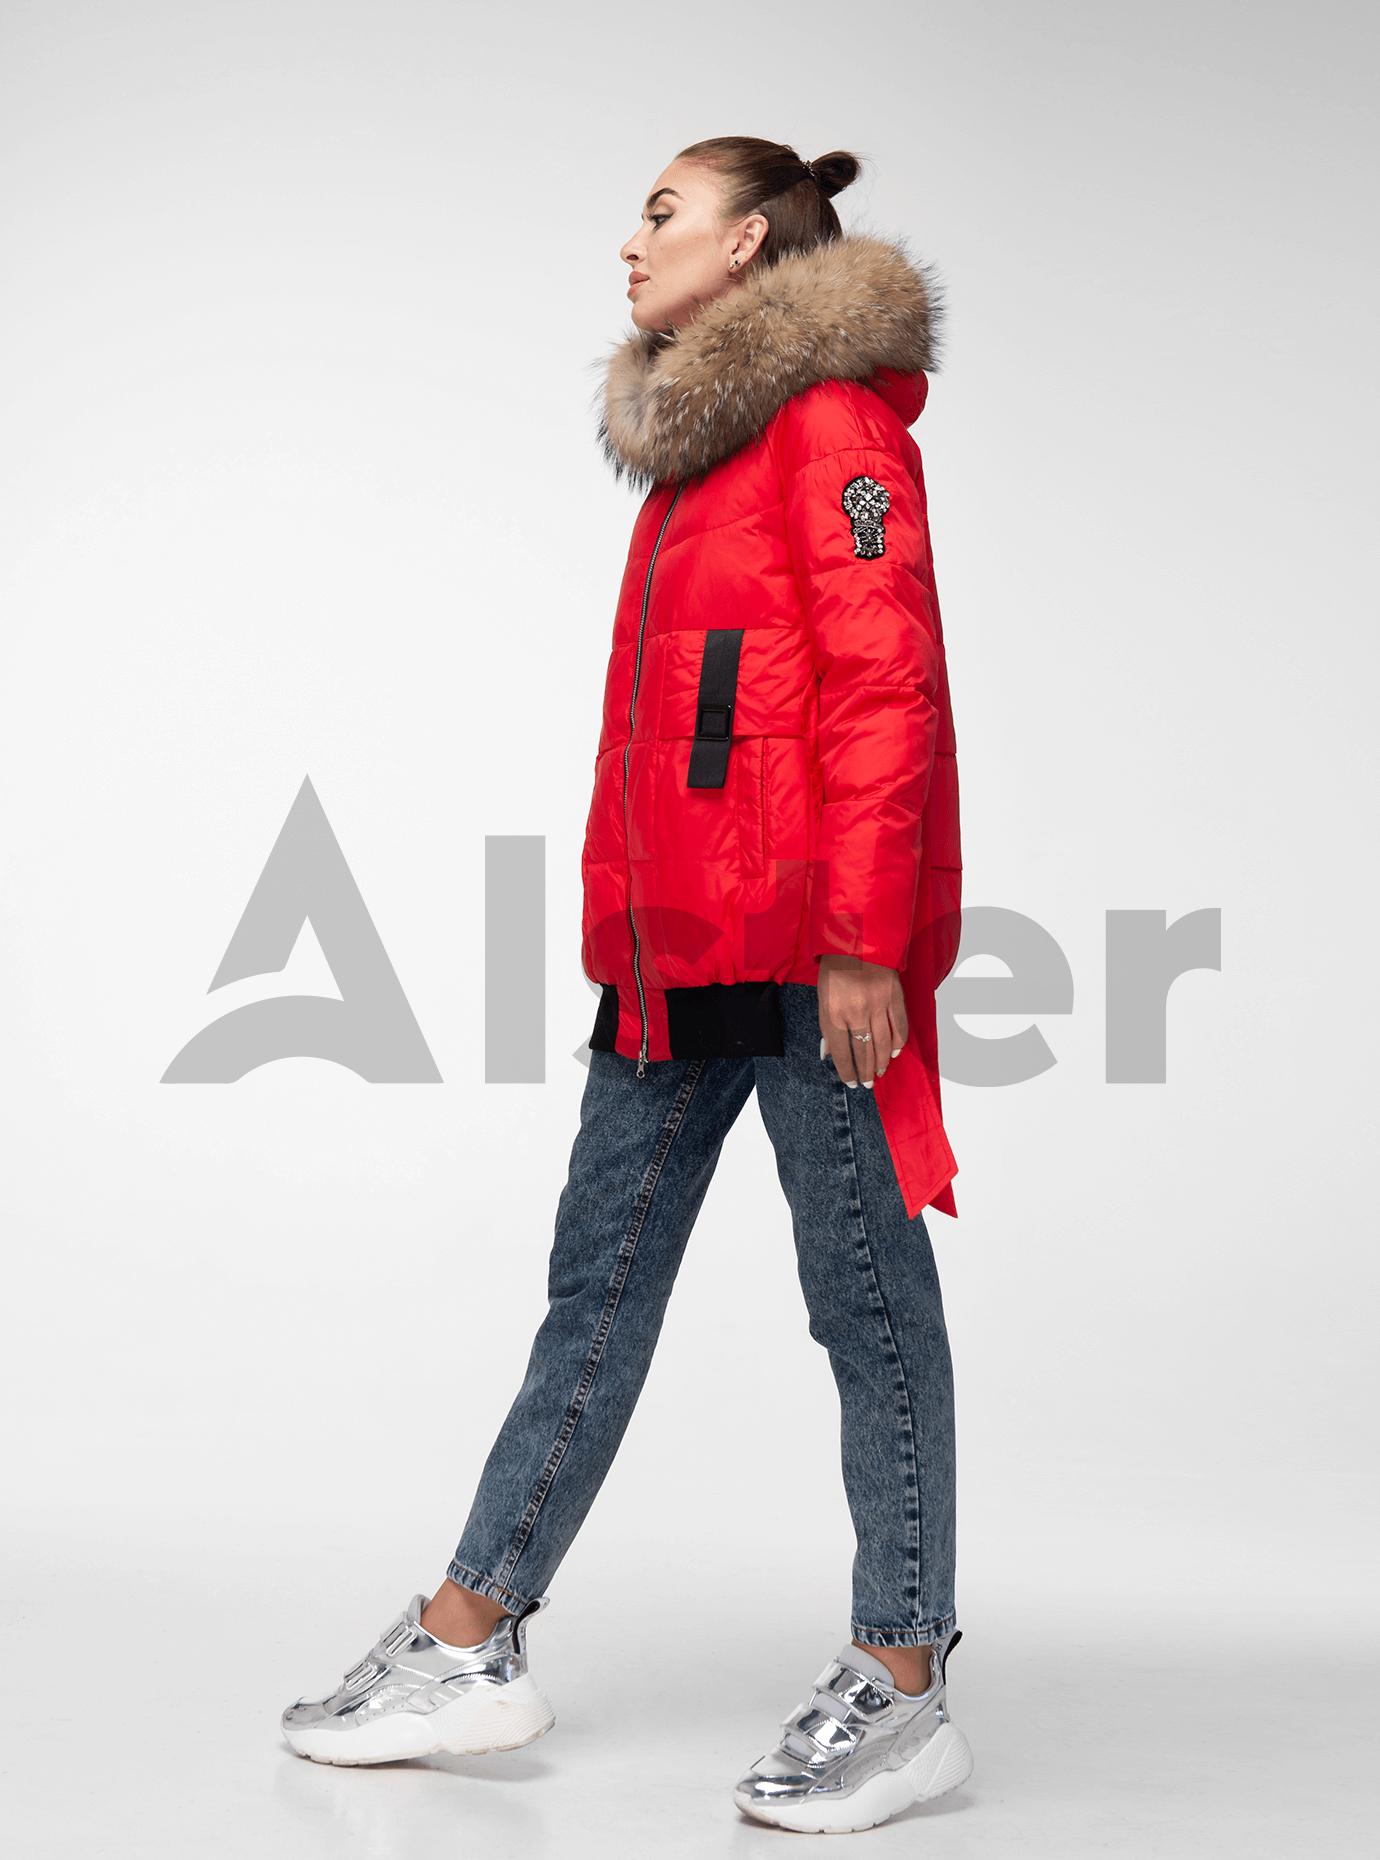 Куртка зимняя с завязками и мехом енота Розовый L (02-V191102): фото - Alster.ua